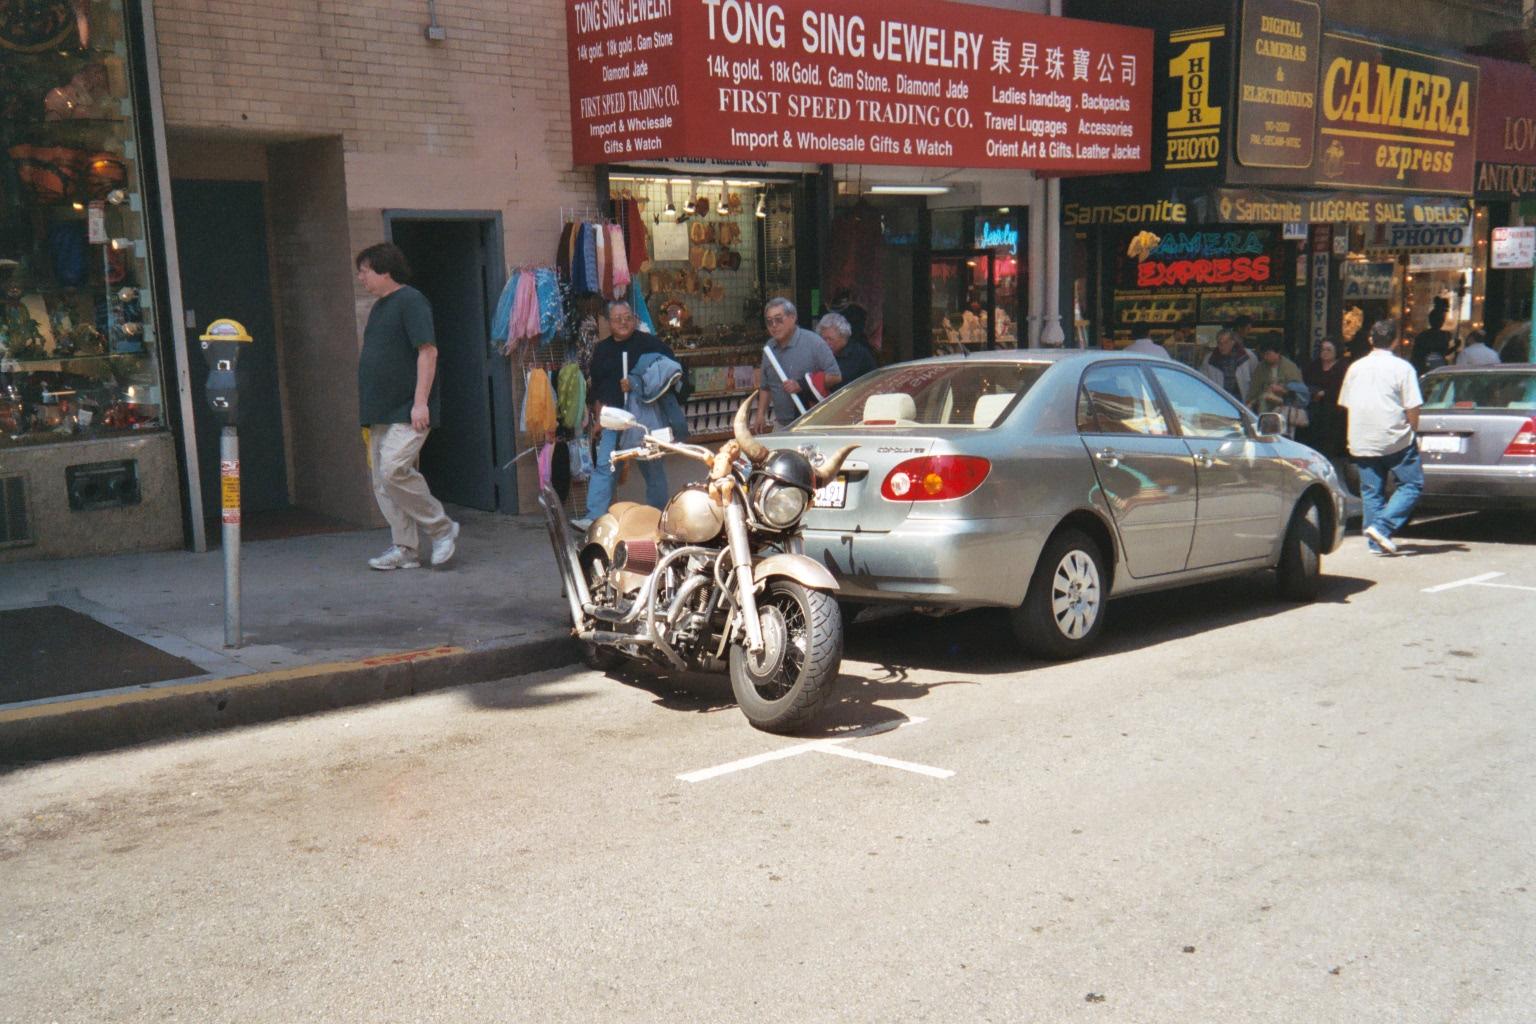 Bike in Chinatown